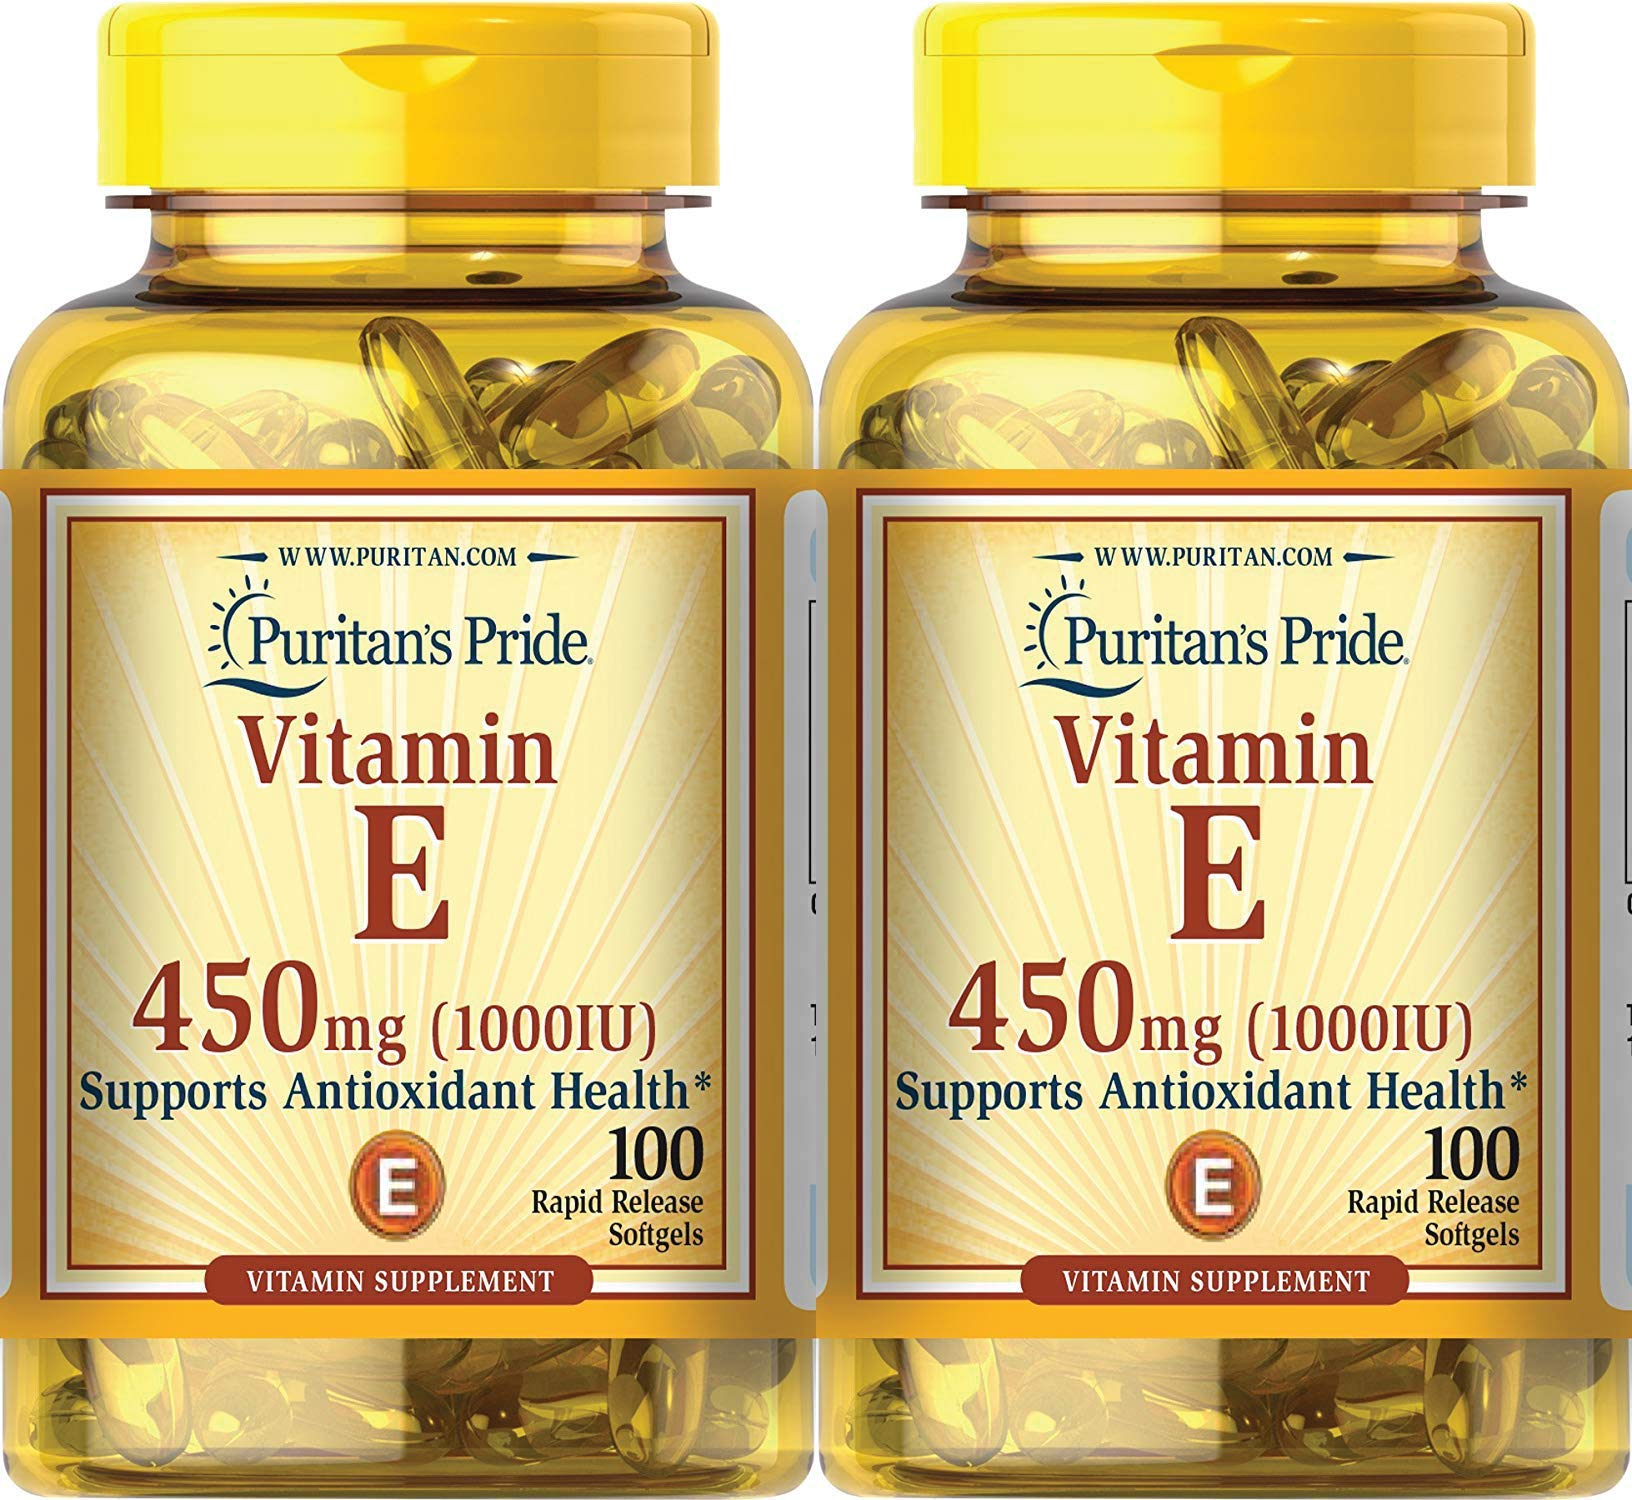 Puritan's Pride Vitamin E 1000 IU Soft Gels,100 Count (2 Pack)